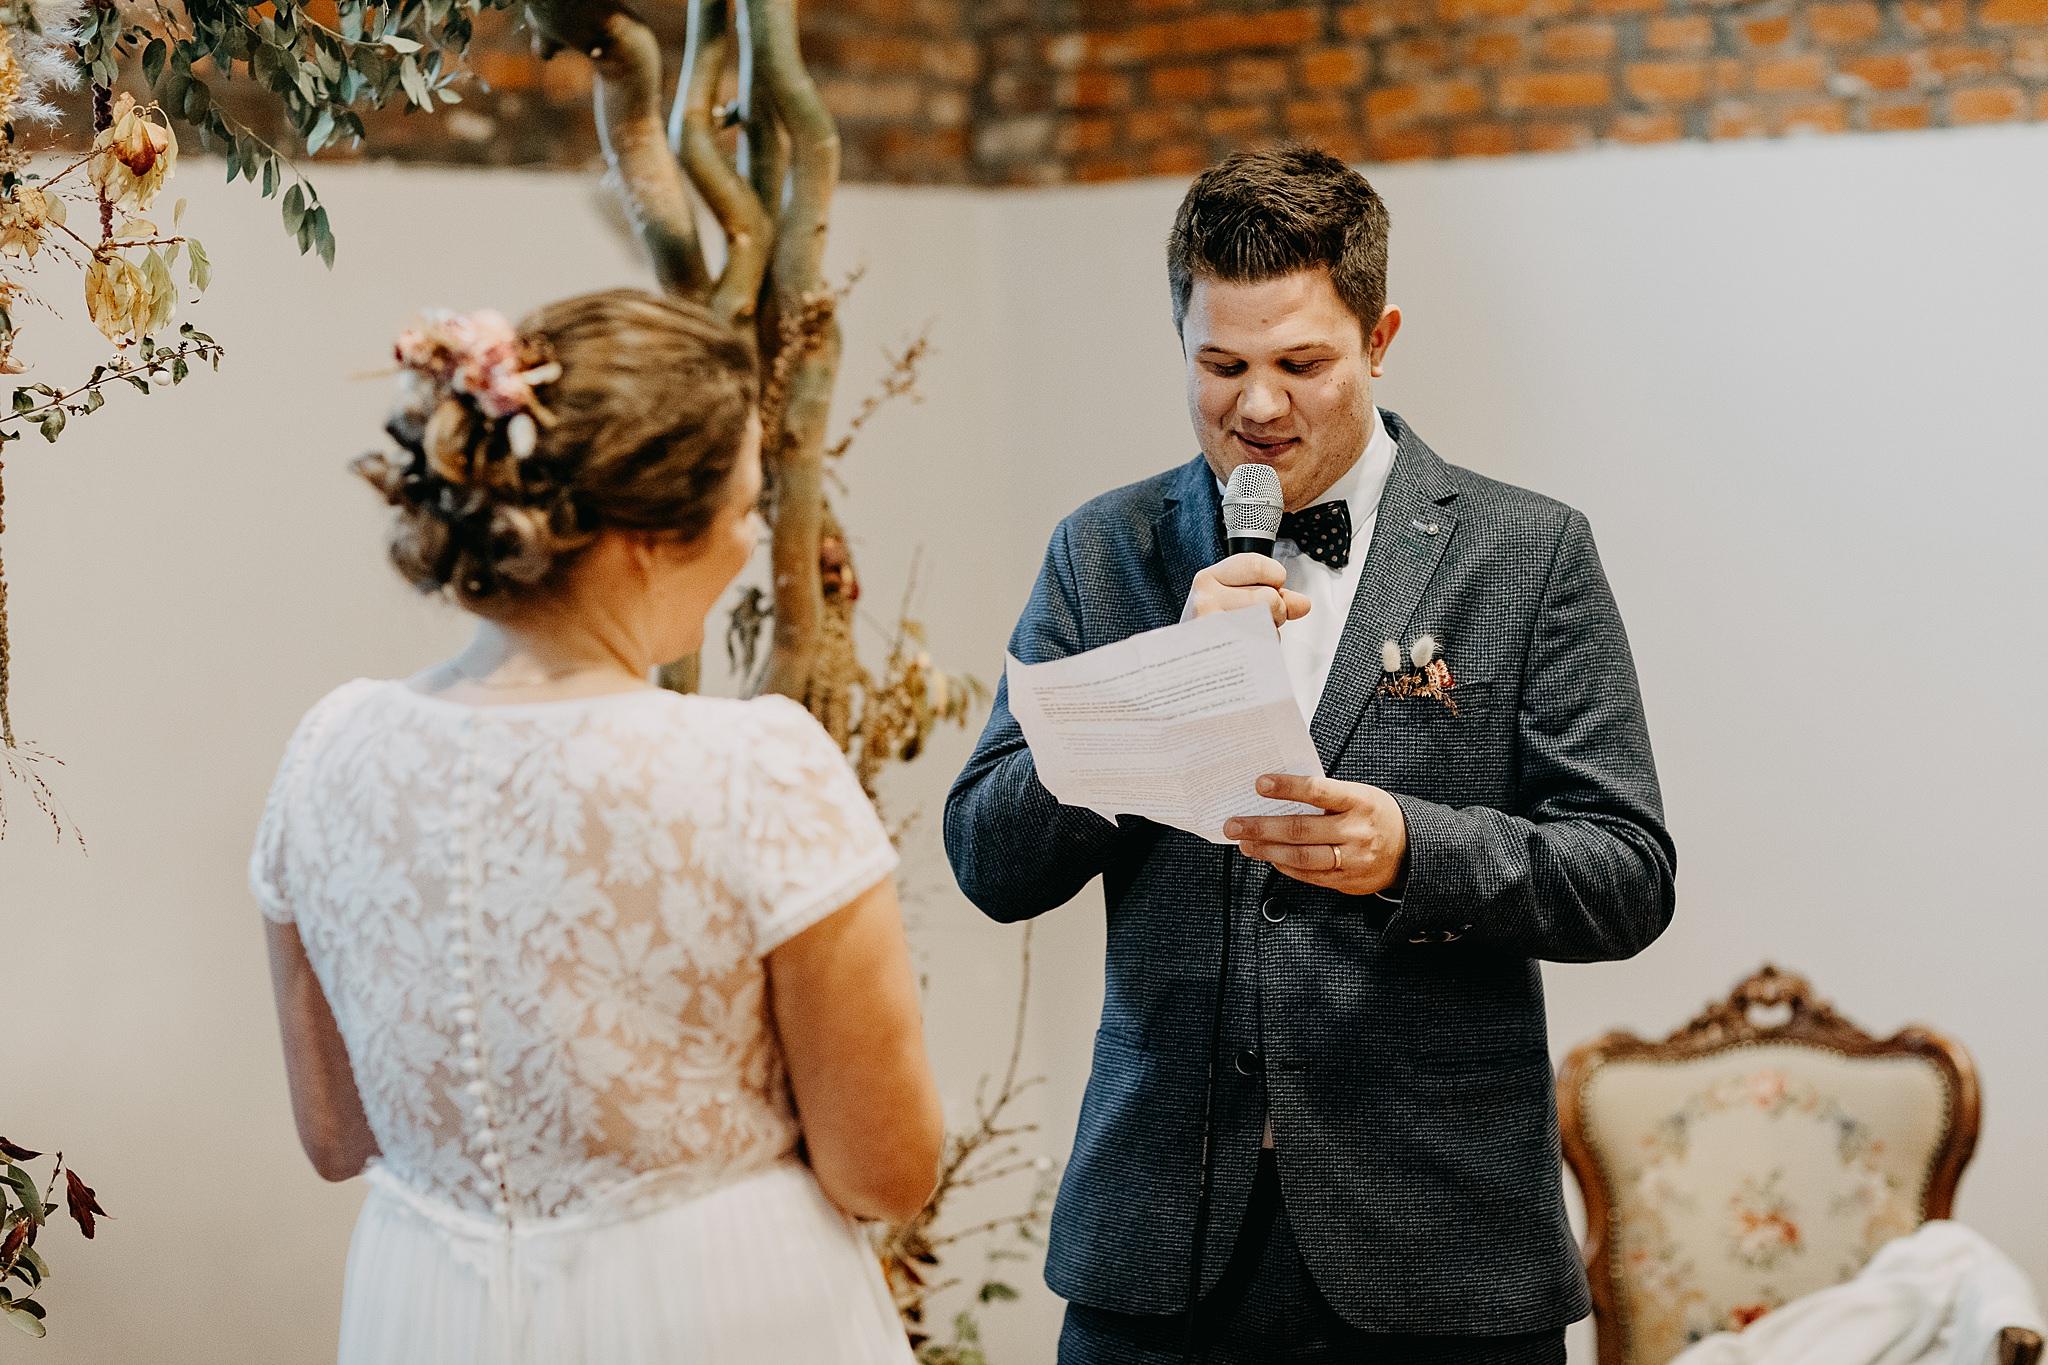 Aulnenhof ja-woord bruidegom huwelijk